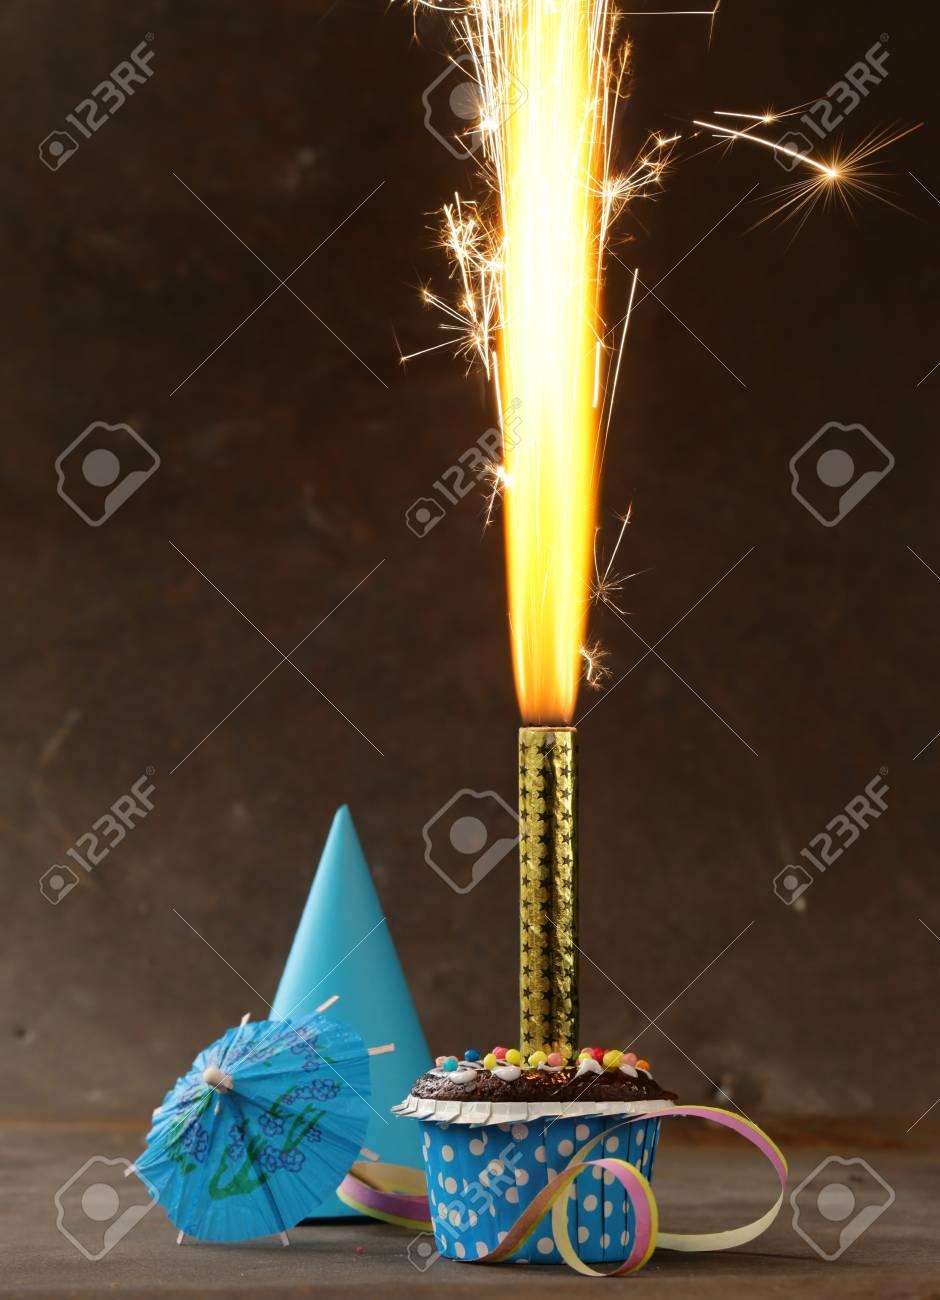 Festive Birthday Dessert Cake With Lighted Fireworks Stock Photo